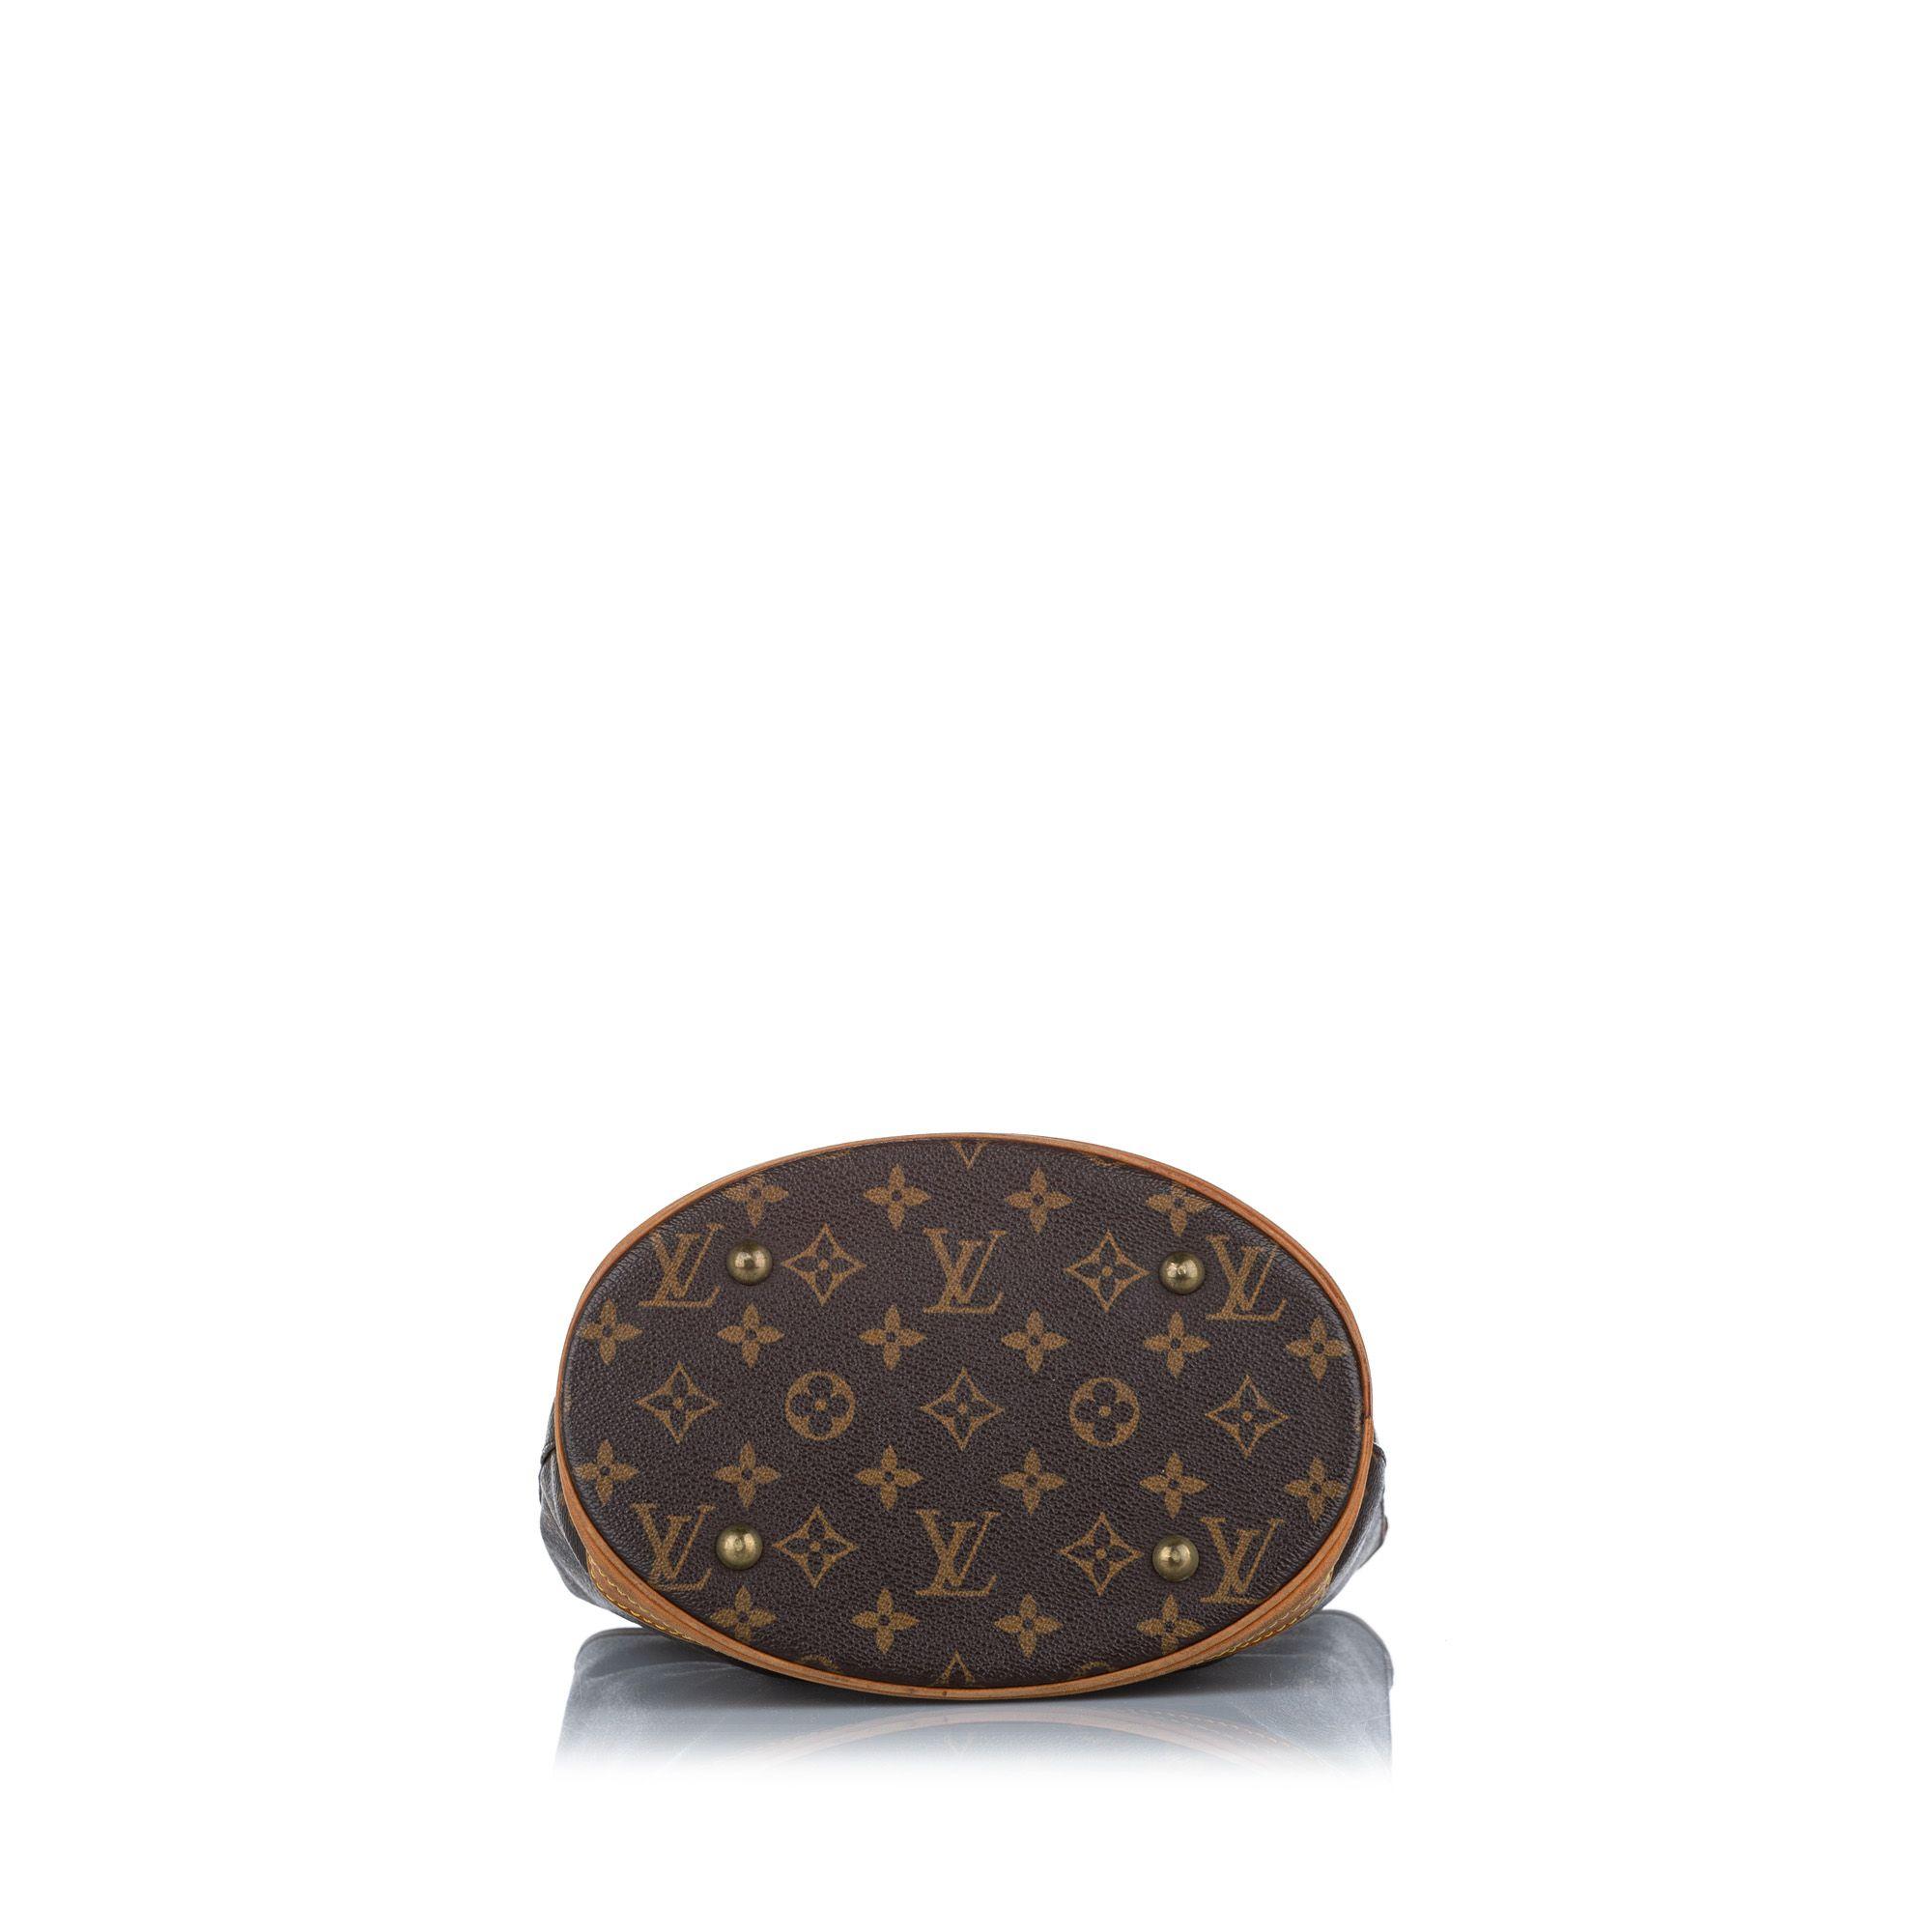 Vintage Louis Vuitton Monogram Petit Bucket Brown